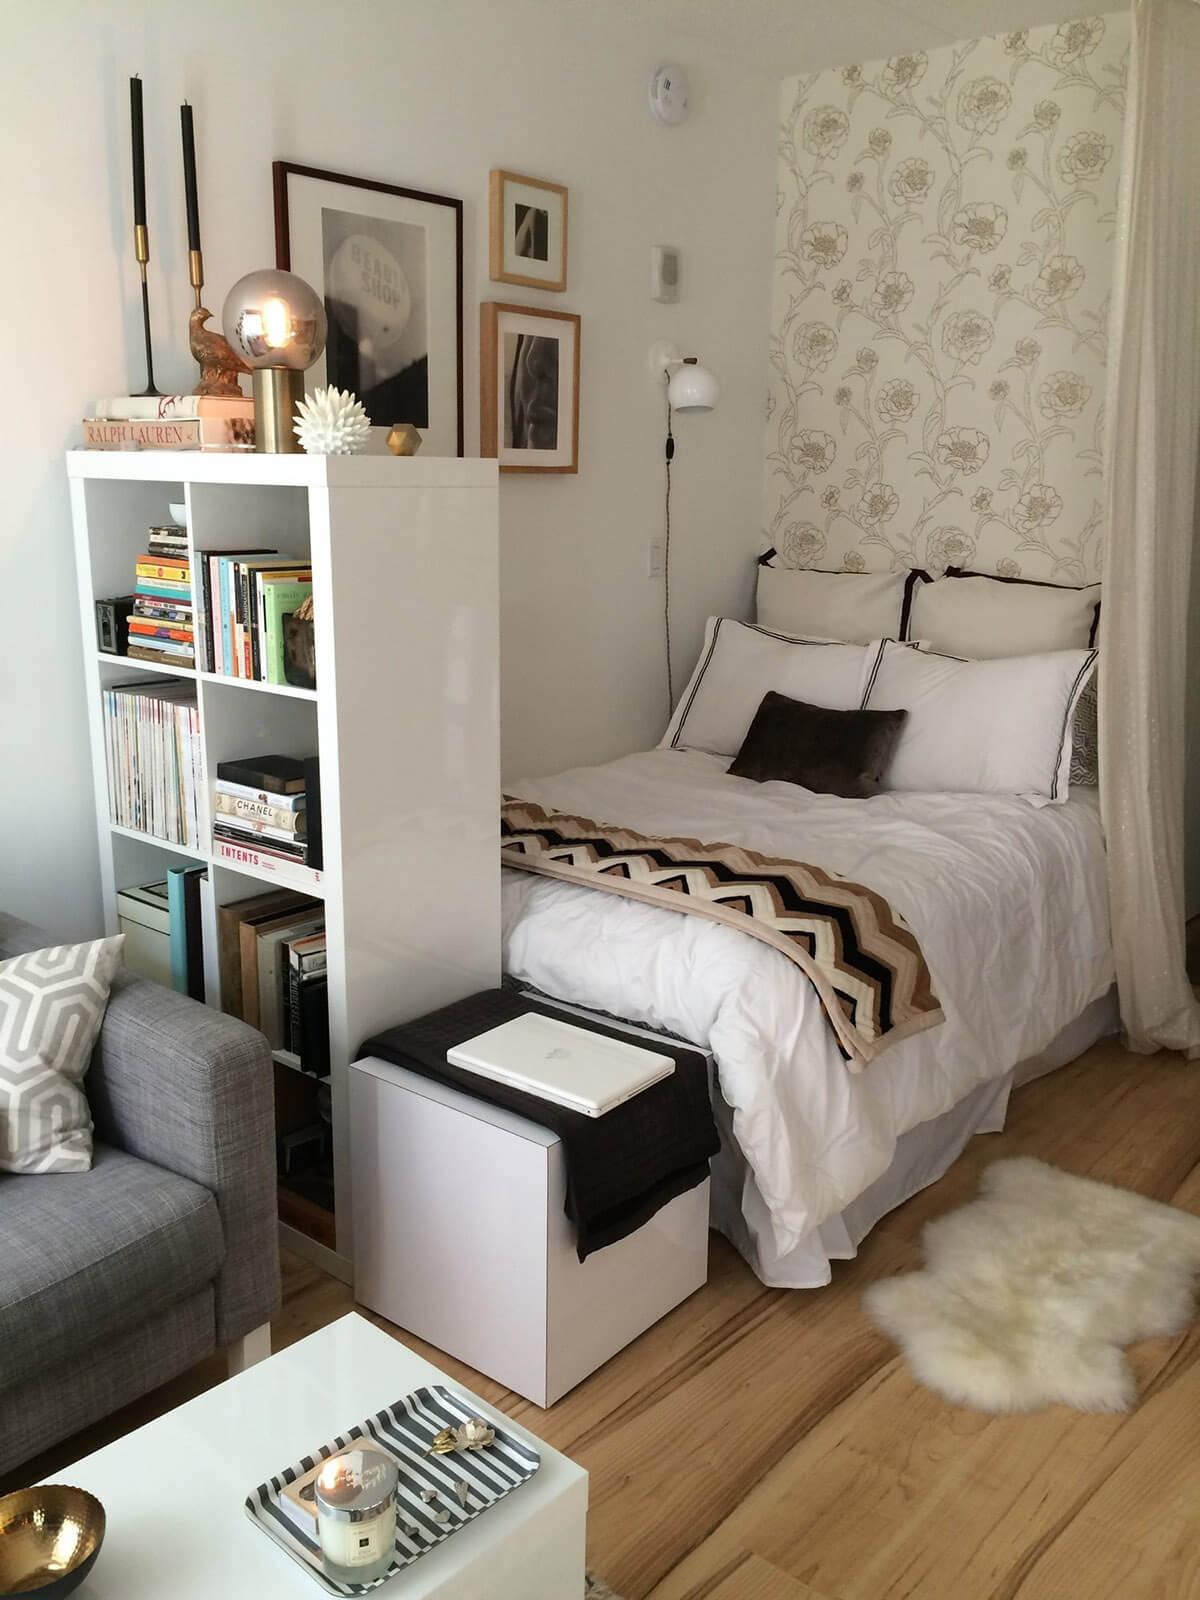 01 small bedroom designs and ideas homebnc.jpg